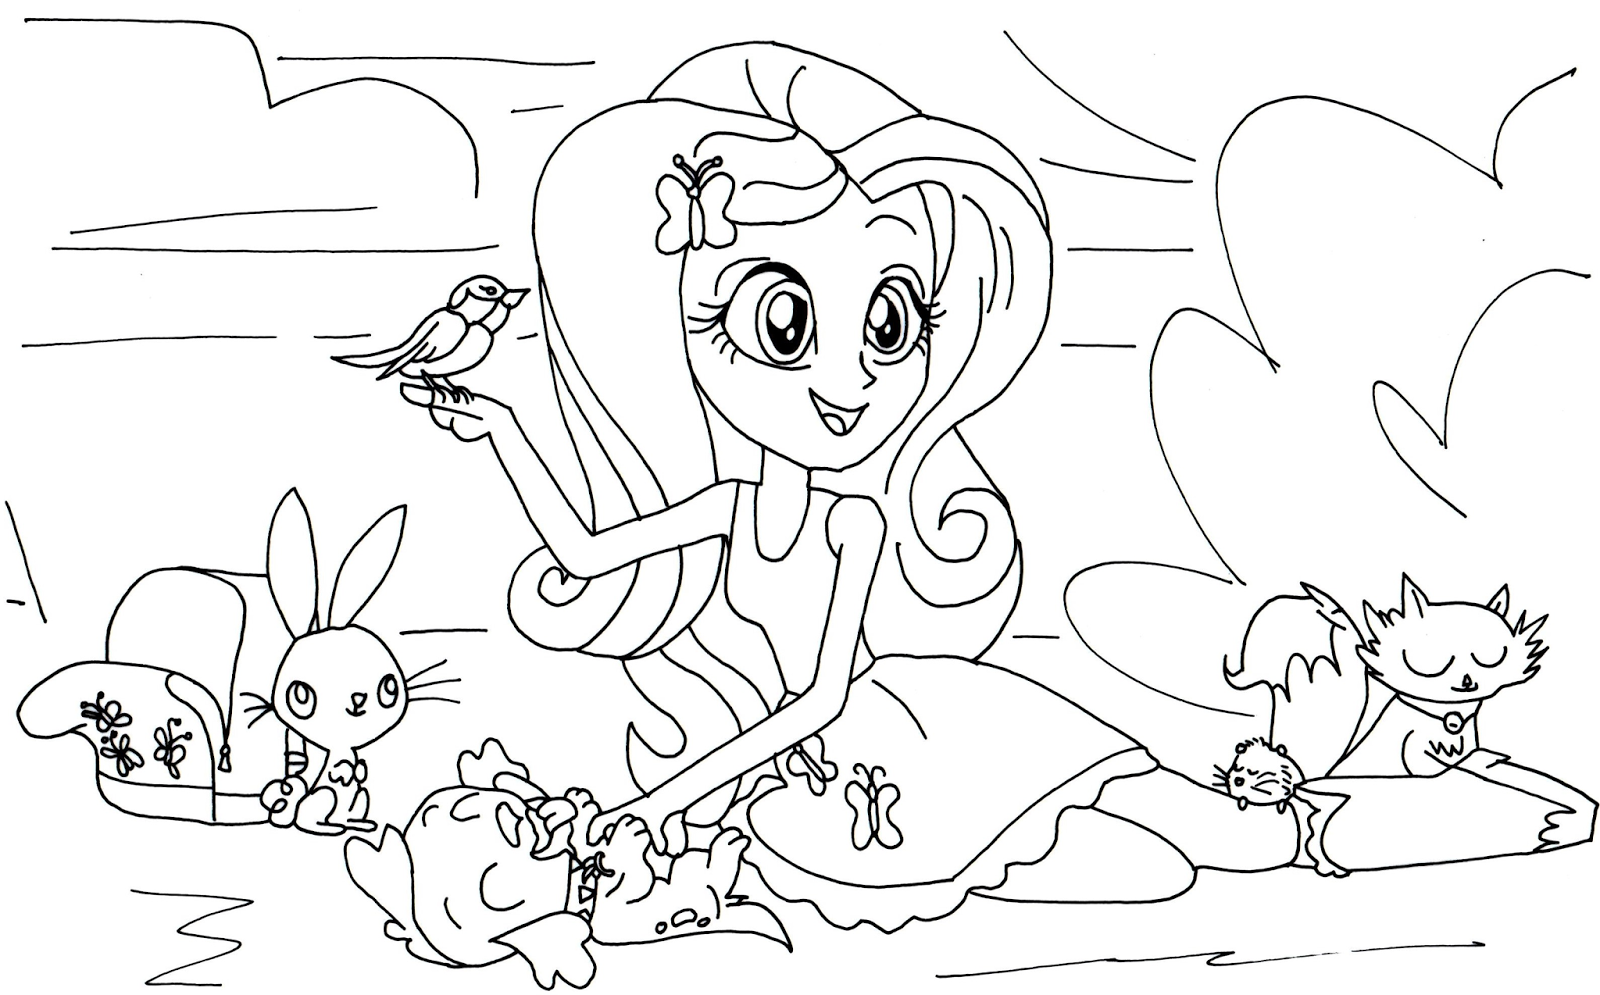 Ausmalbilder My Little Pony Equestria Girl : Mlp Eg Coloring Pages Democraciaejustica